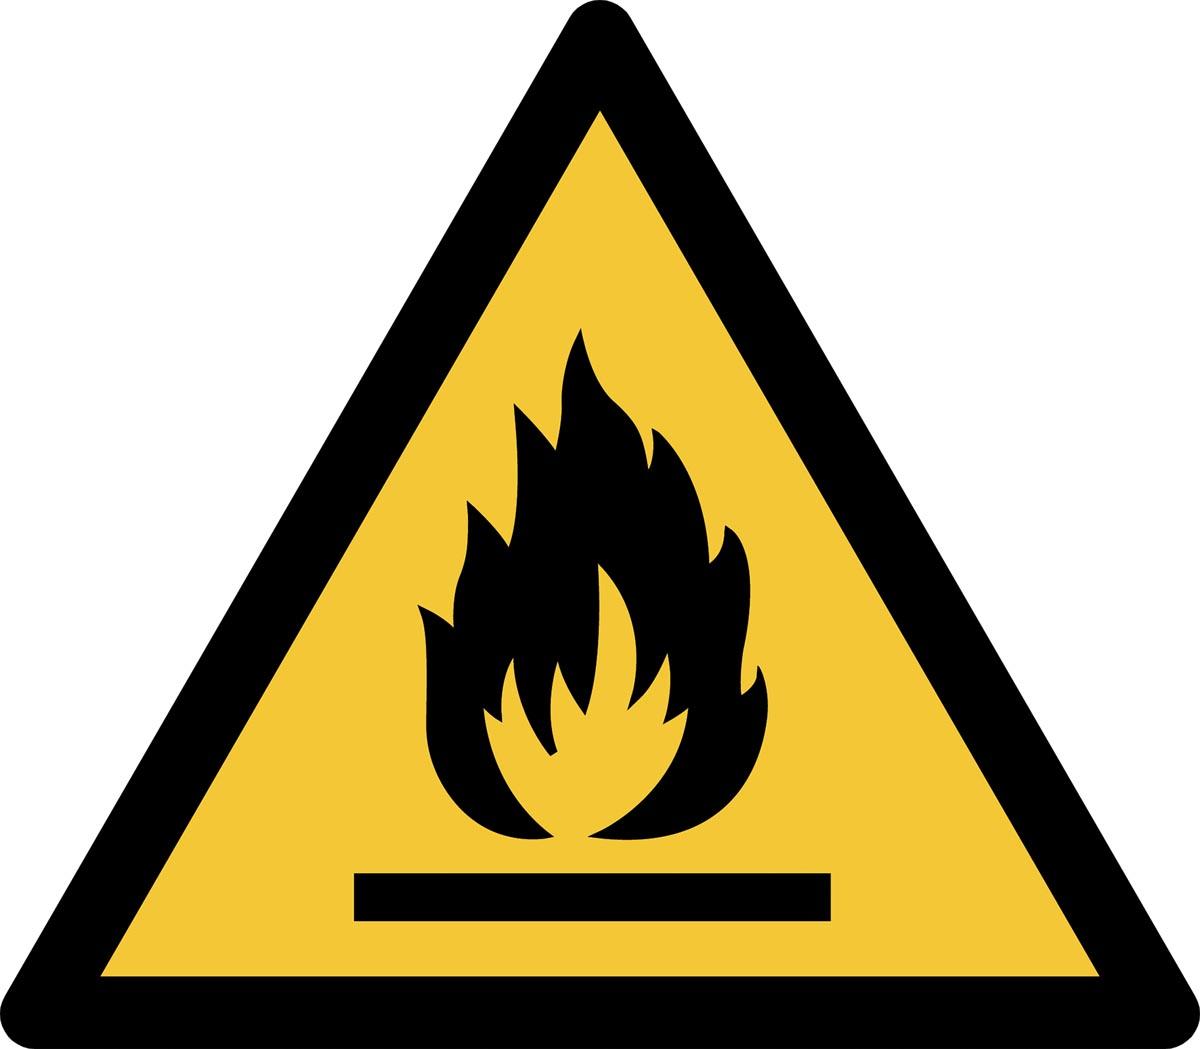 Tarifold waarschuwingsbord uit PP, ontvlambare stoffen, ft 20 x 17,6 cm